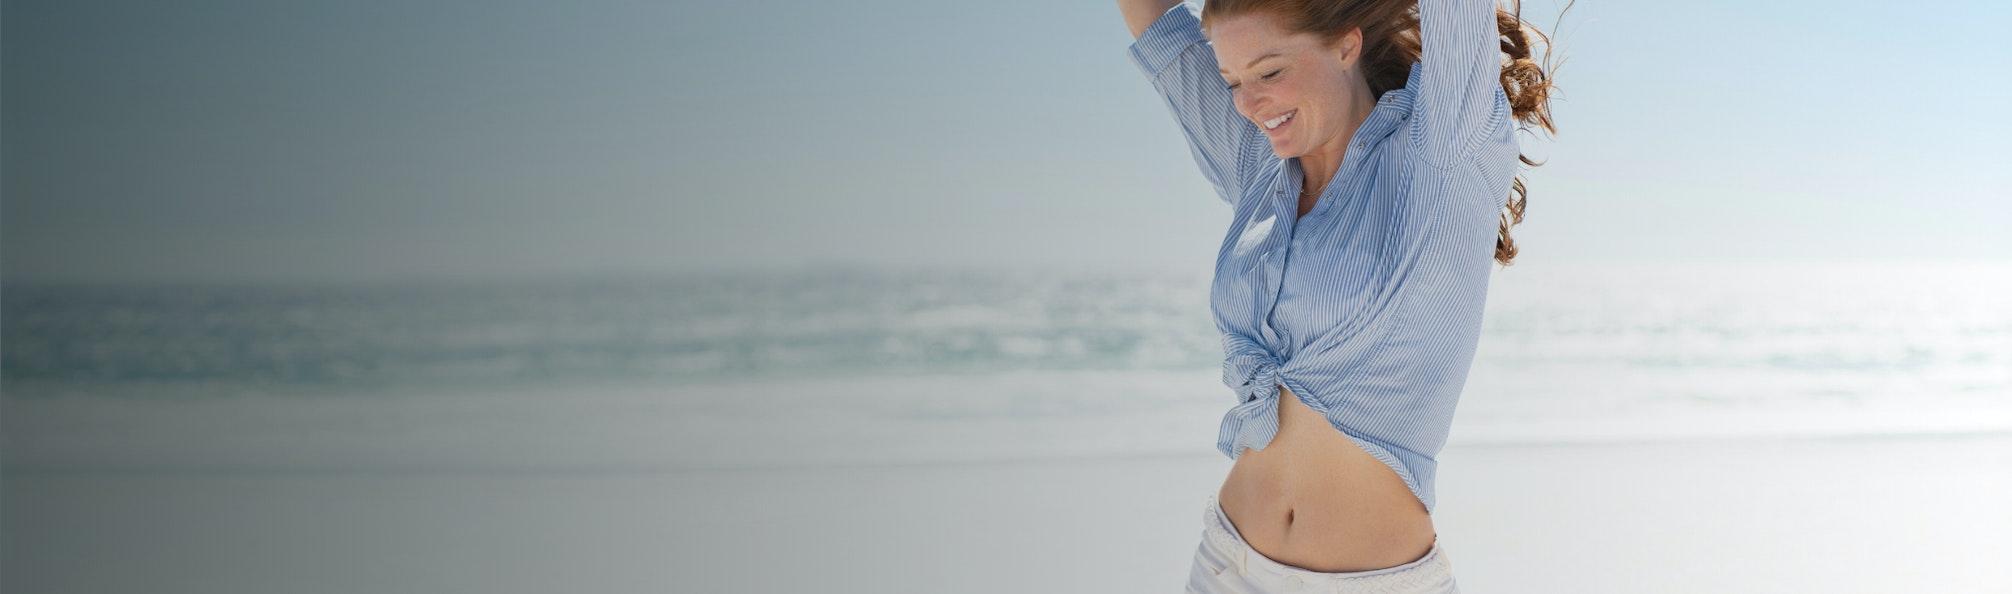 woman celebrating on the beach